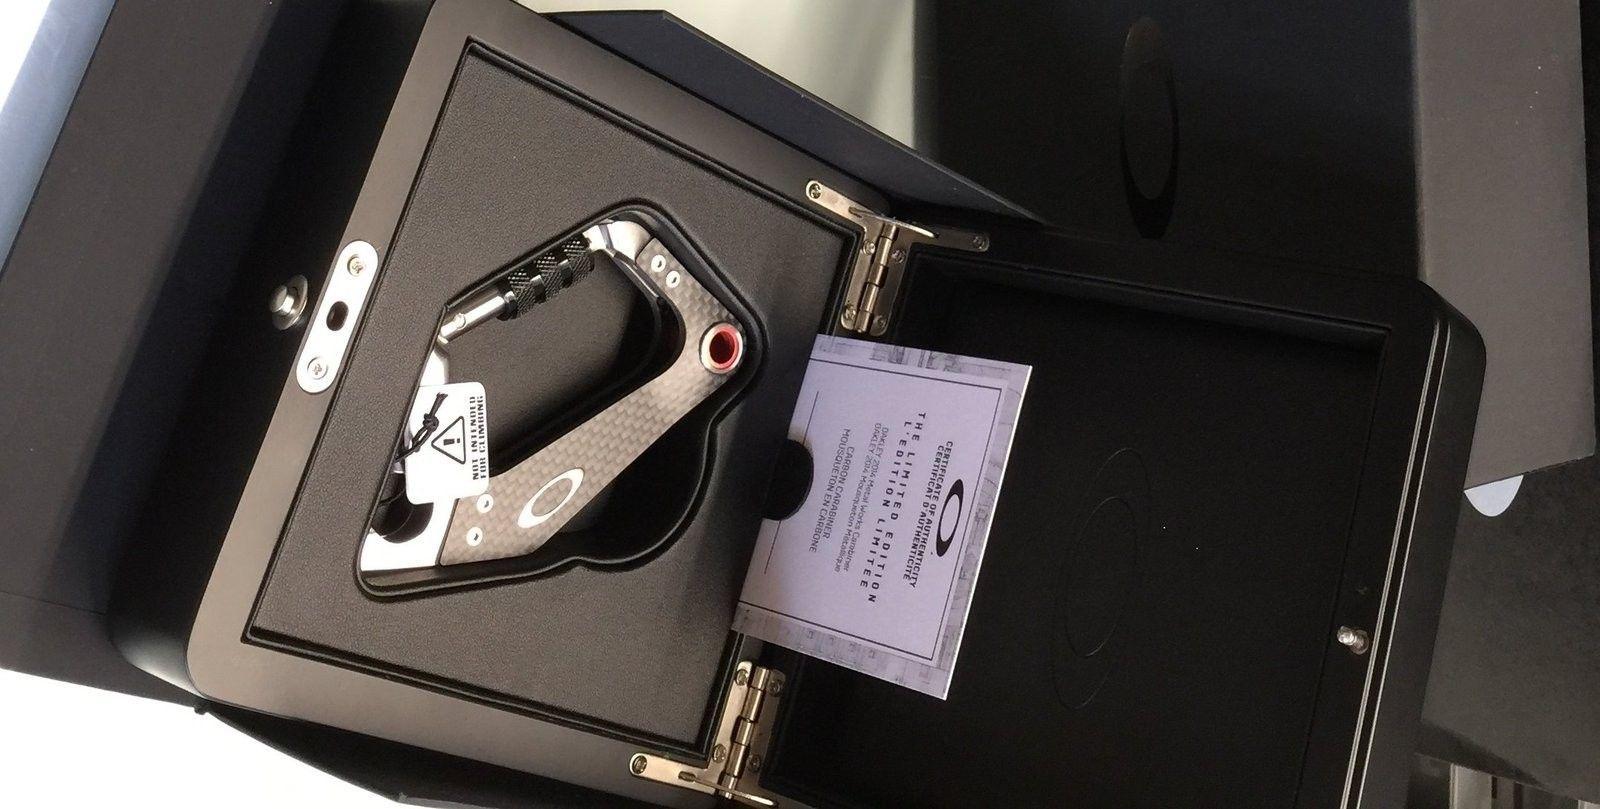 BNIB Limited edition carbon carabiner #463 - IMG_8372a.jpg